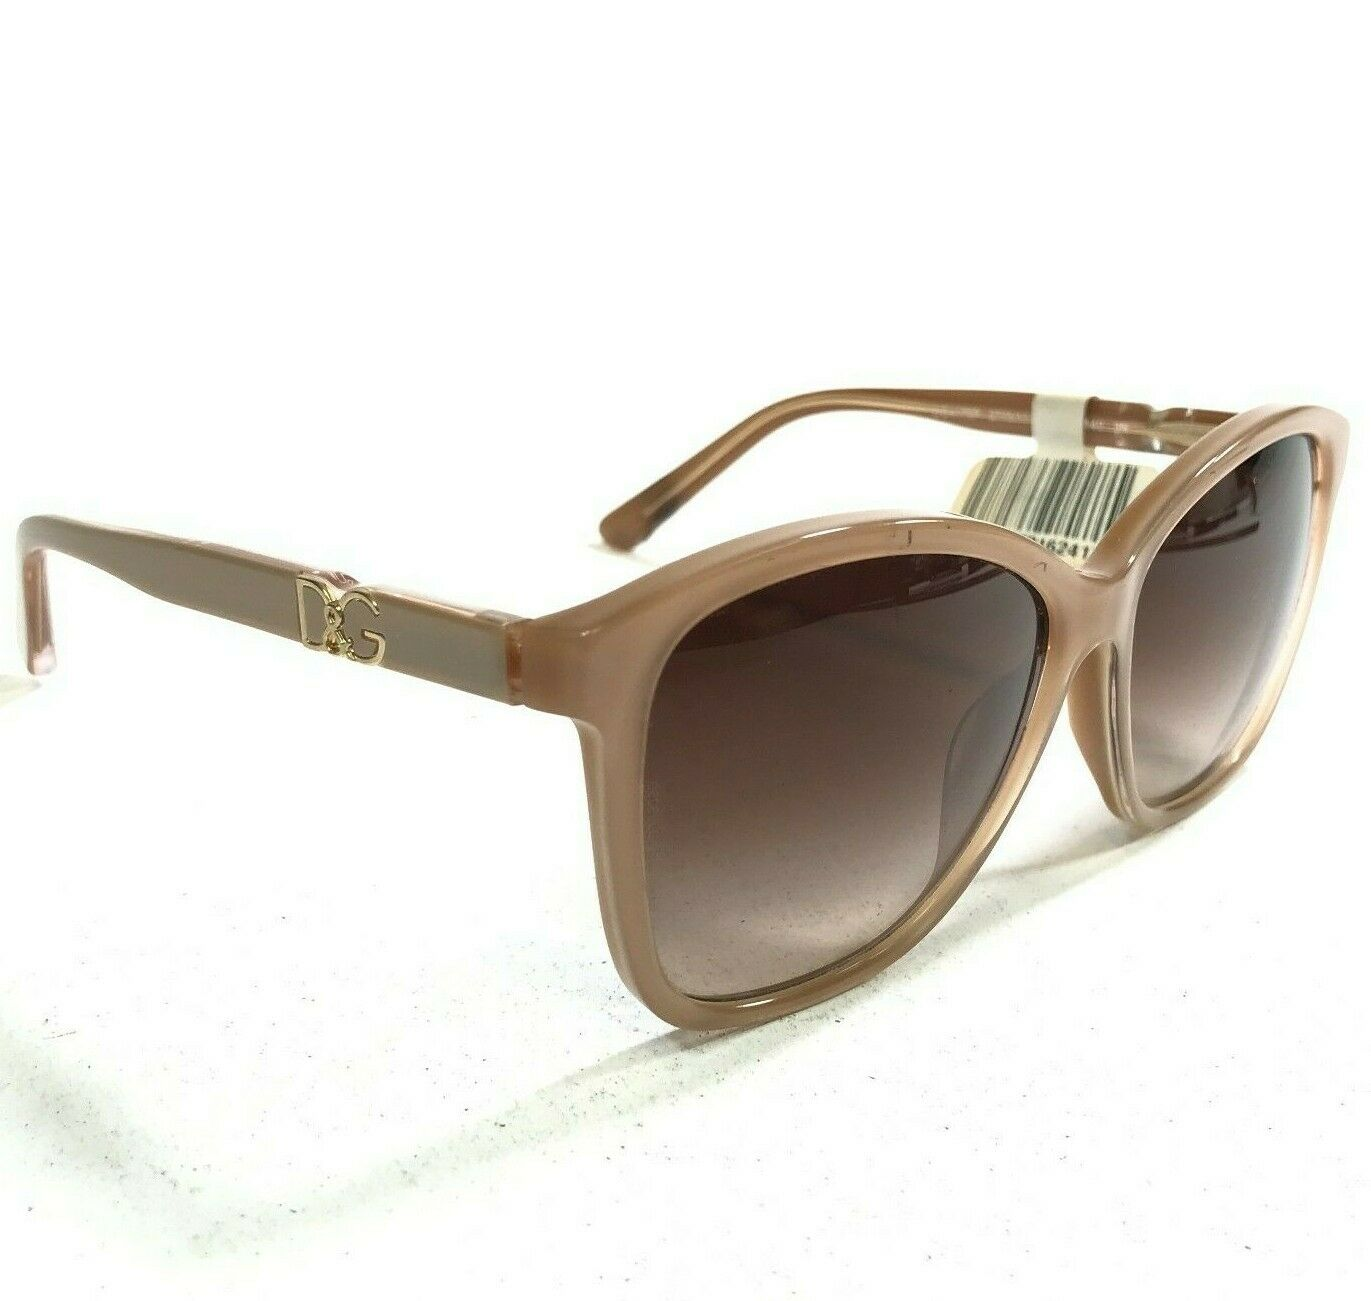 Dolce & Gabbana Sunglasses DG4170P 2773/13 Clear Brown Beige Cat Eye Logos *